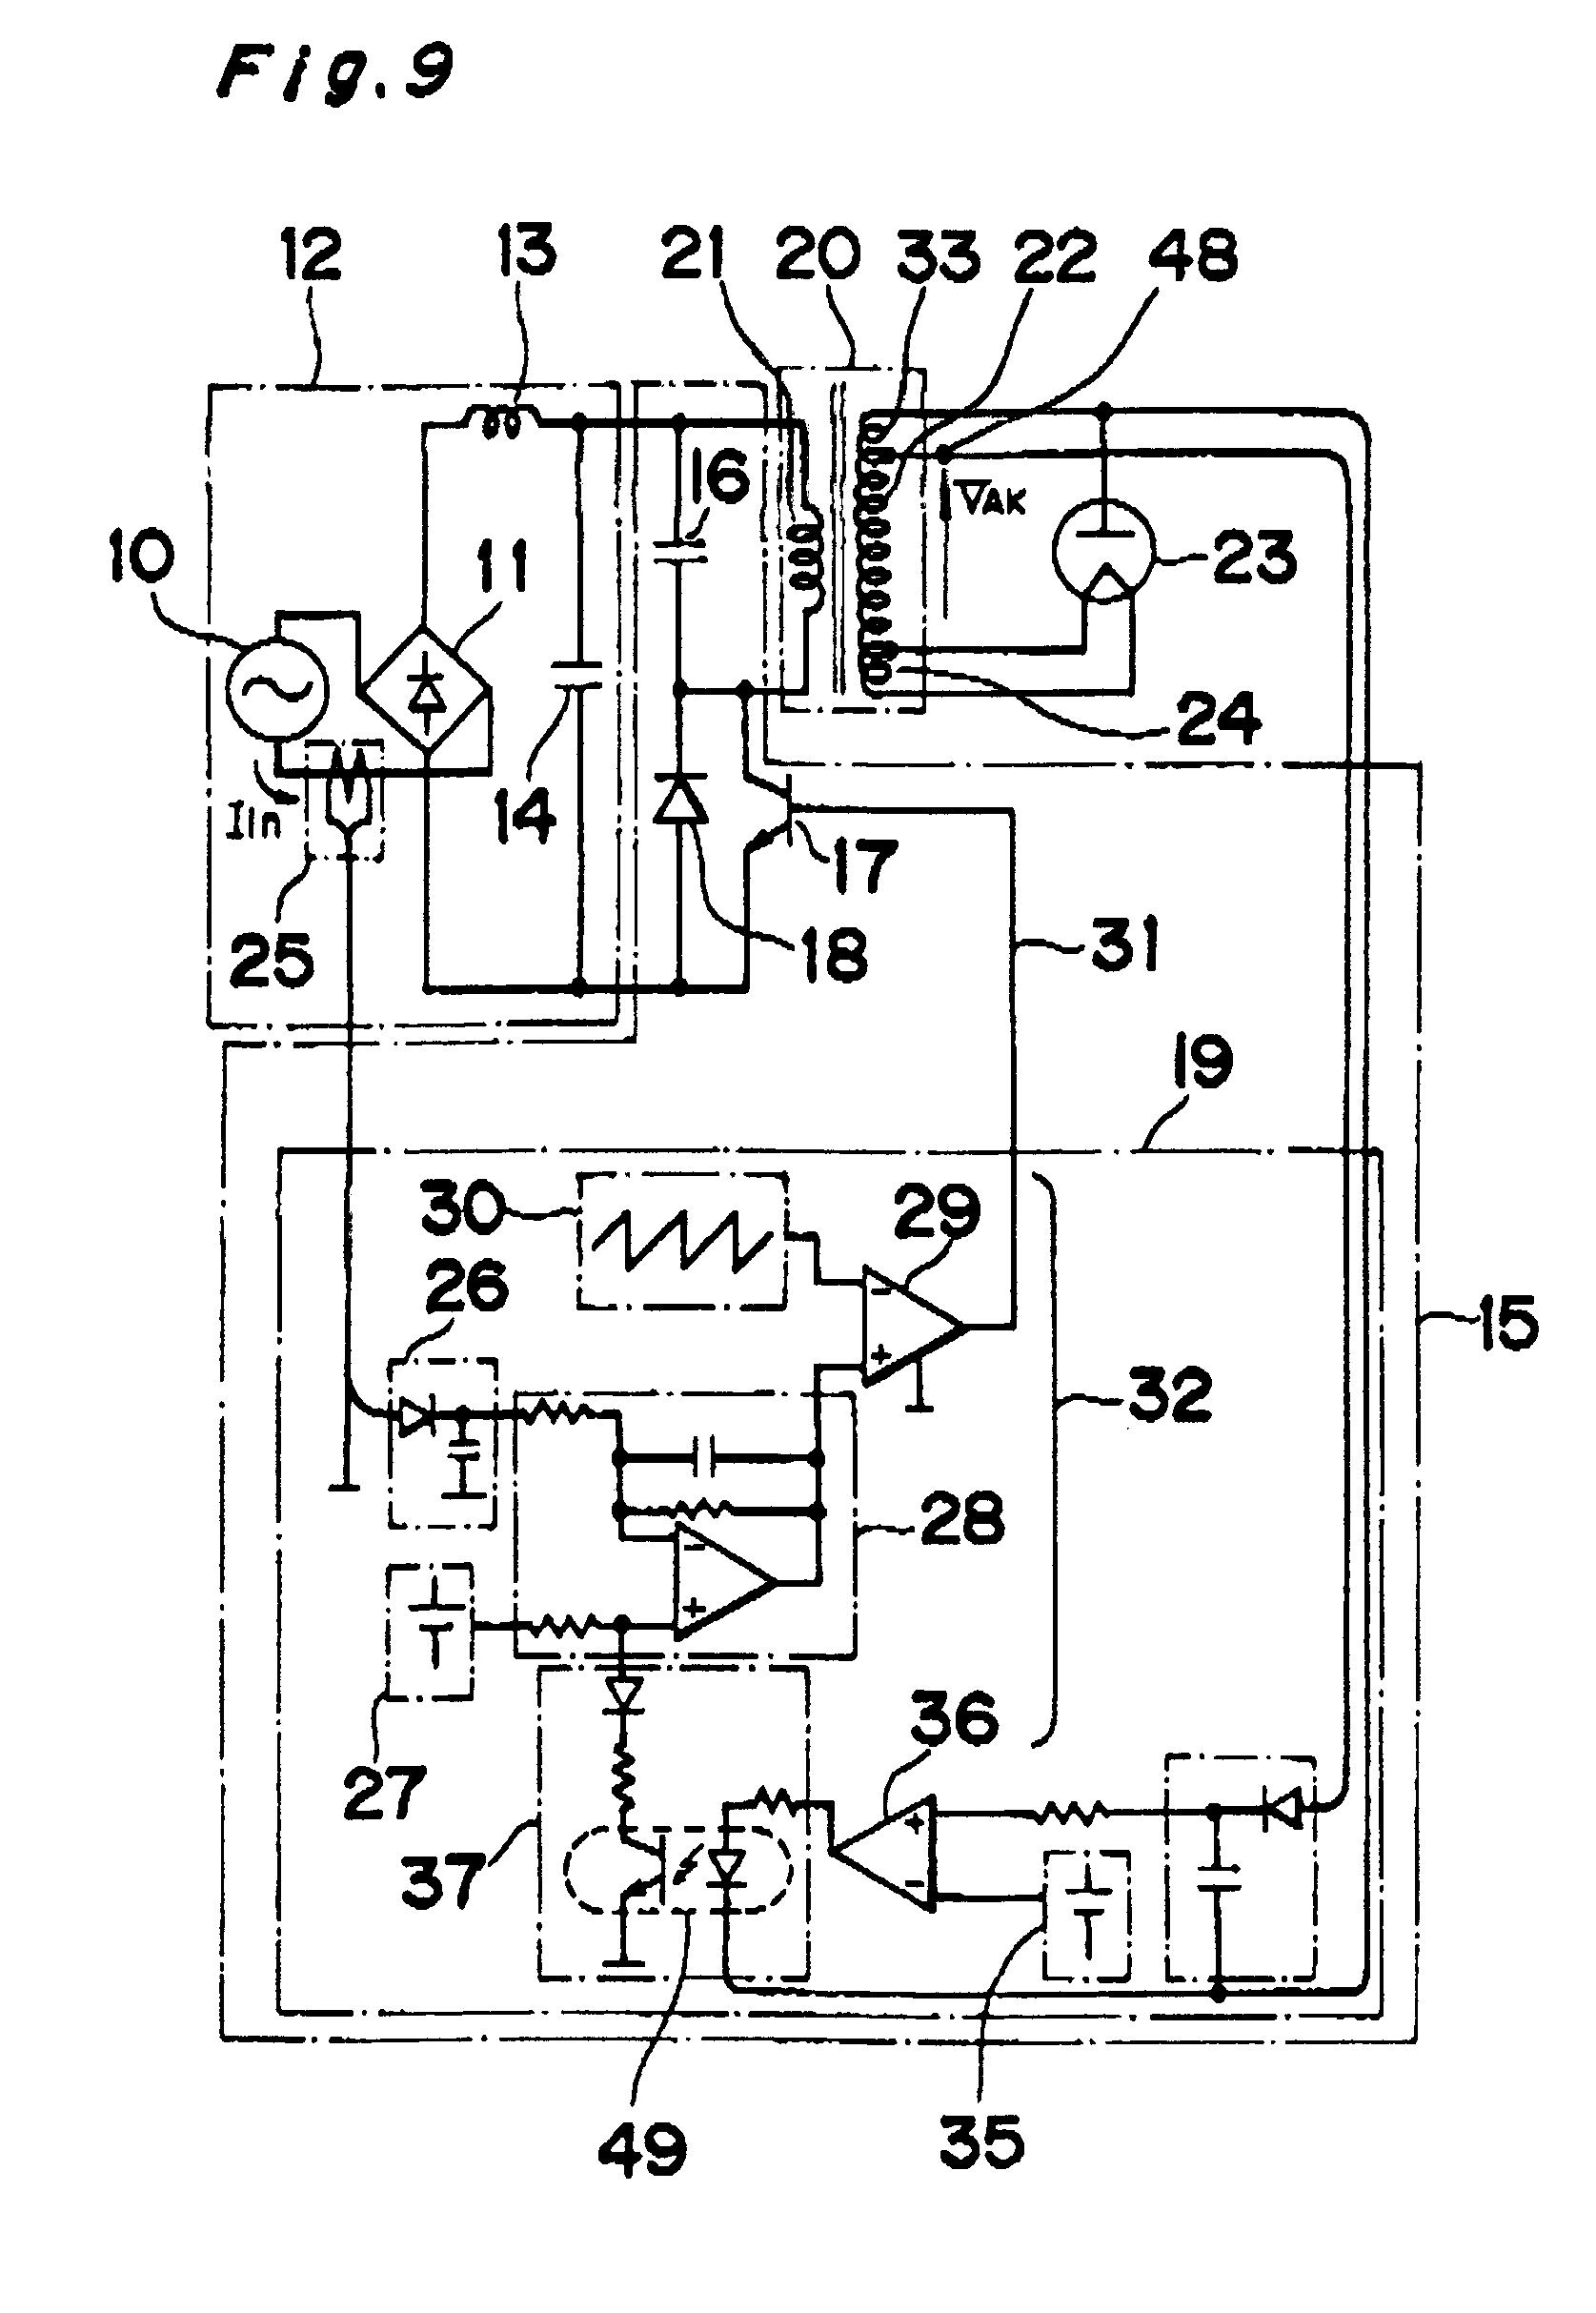 Output Wiring 5 Diagram Transformer Ftcho - WIRE Center •